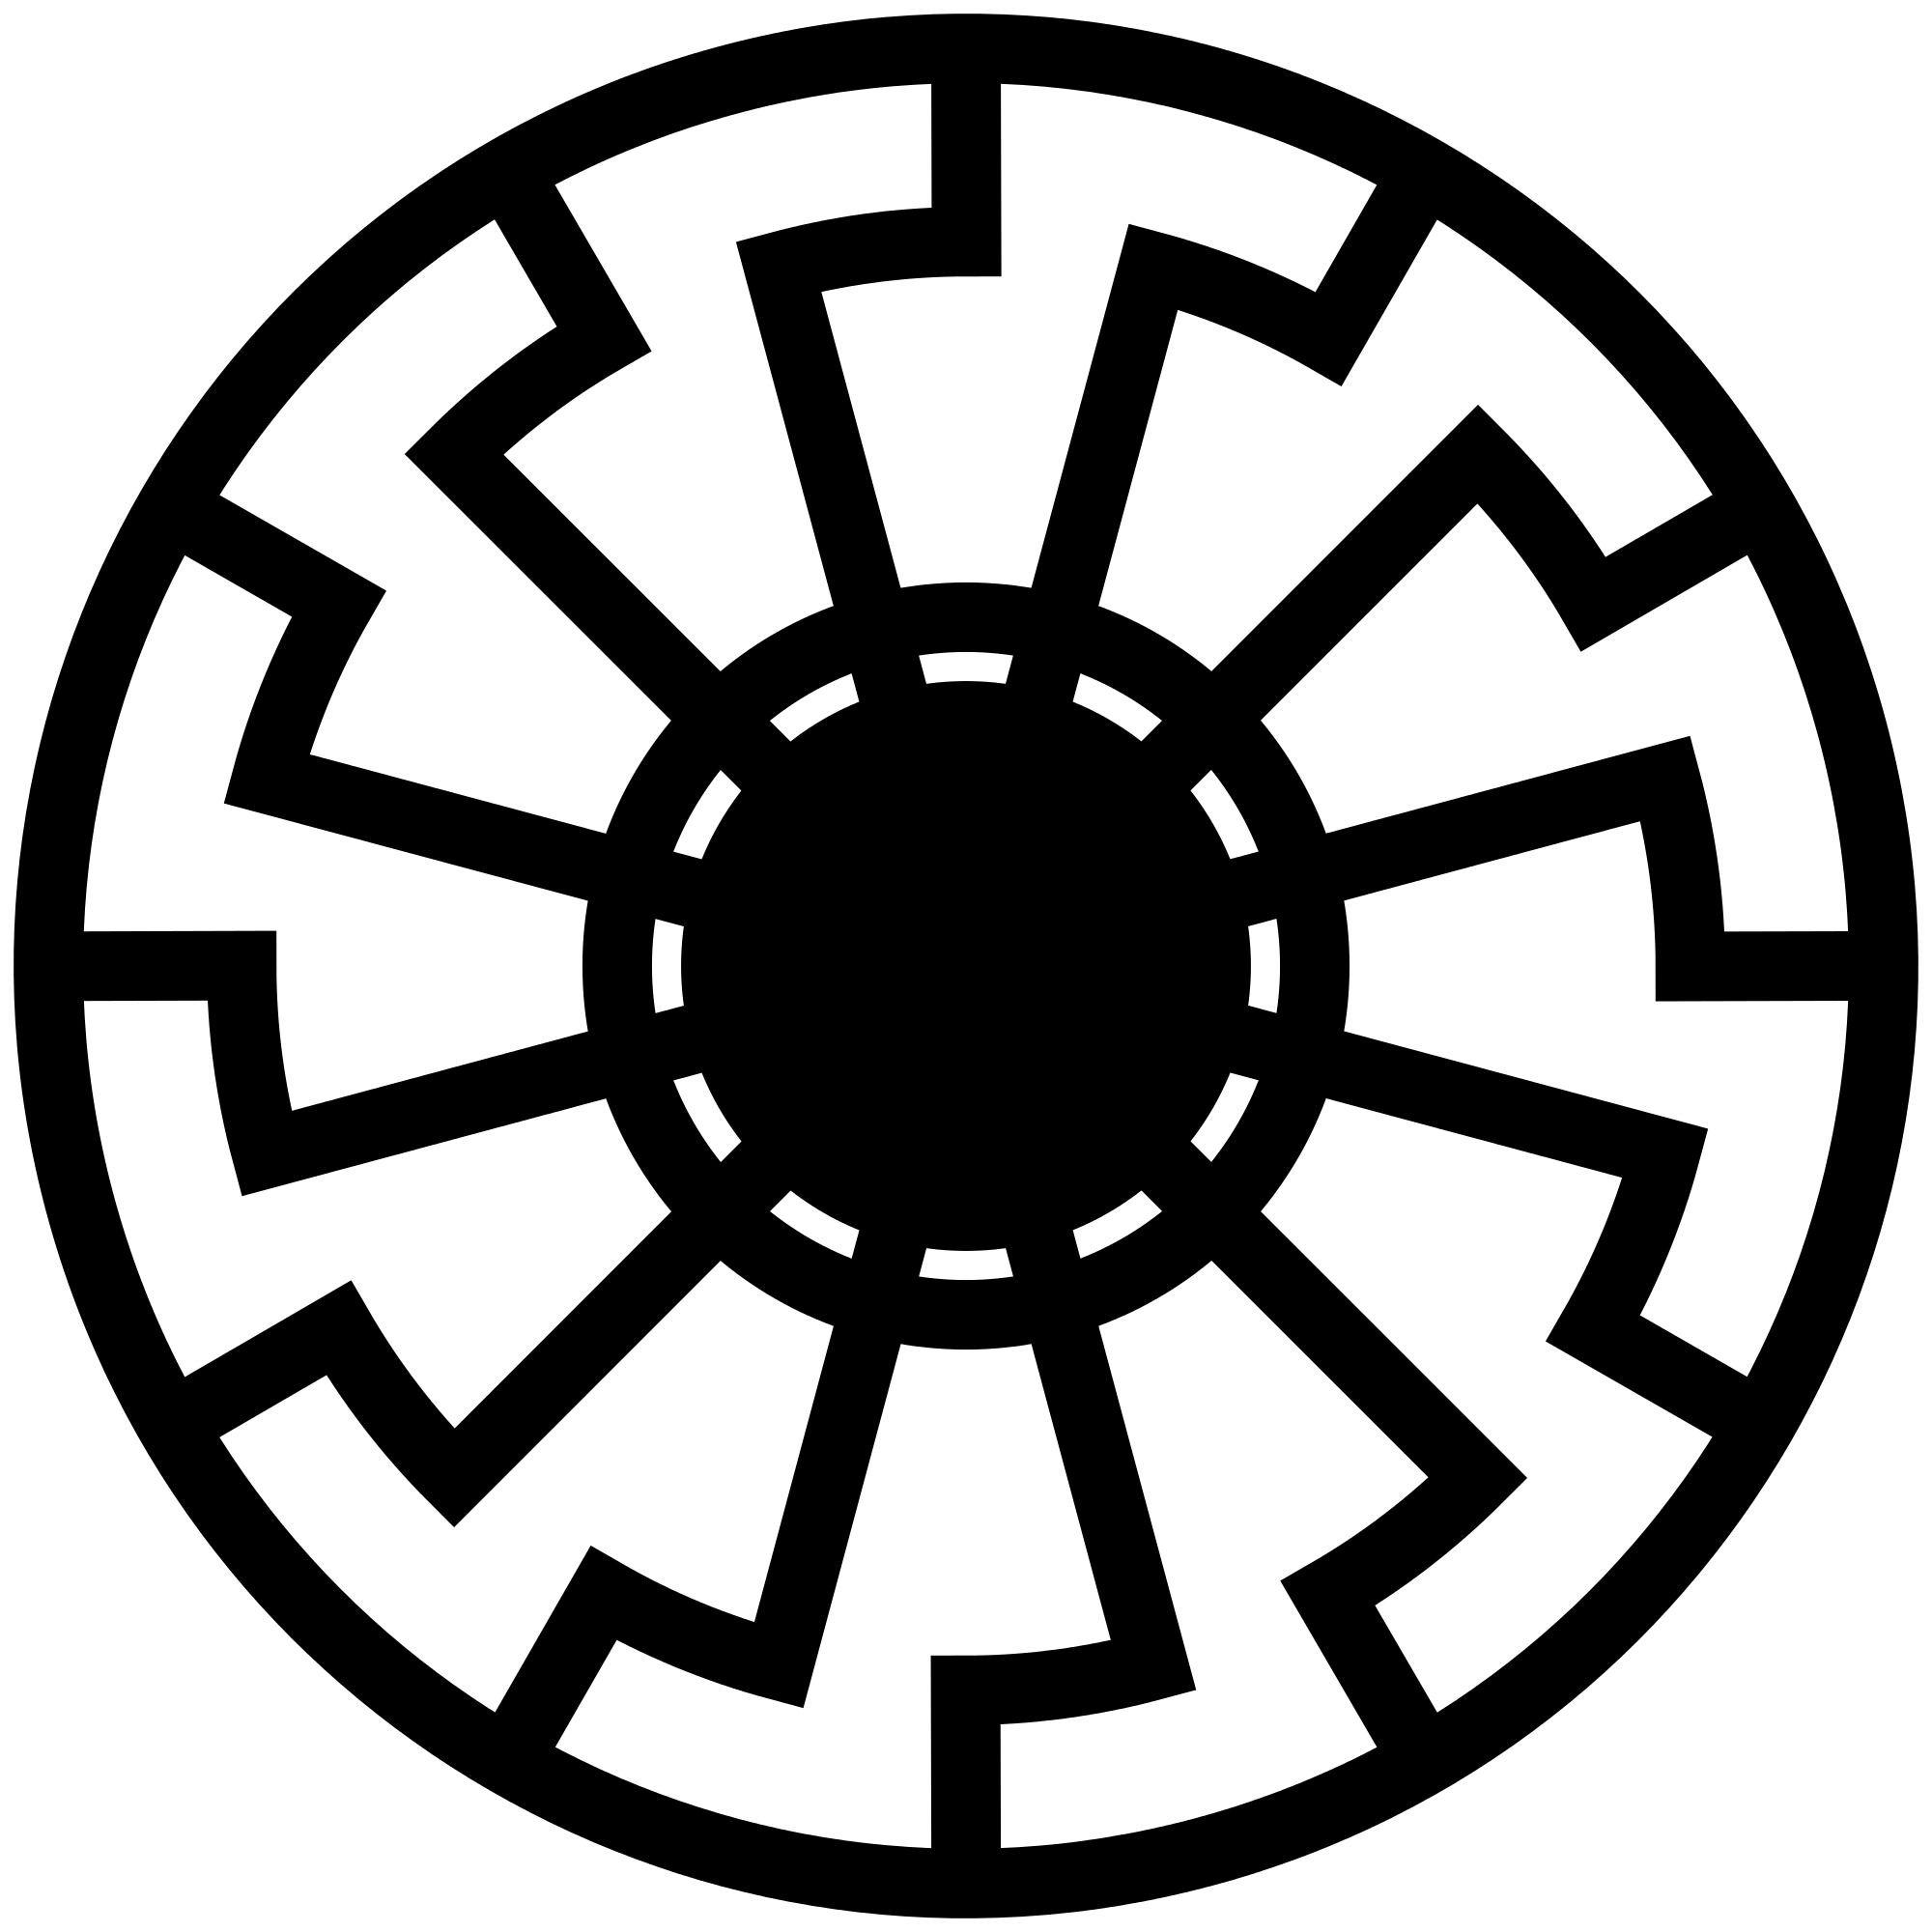 Black sun occult symbol. Clipart sunshine sunn